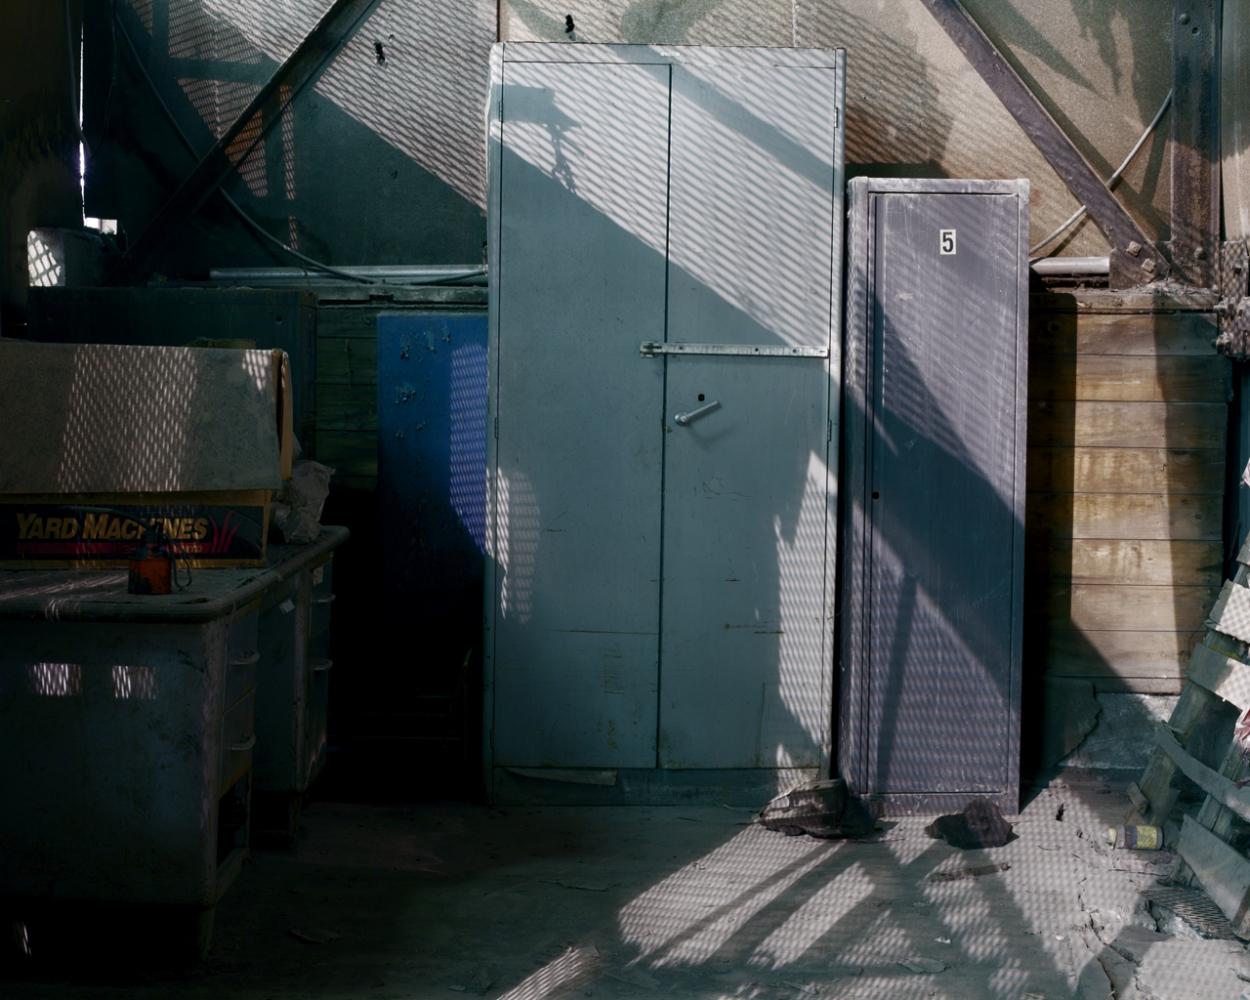 Steel Cabinets (MWS), Hammond, IN 2013